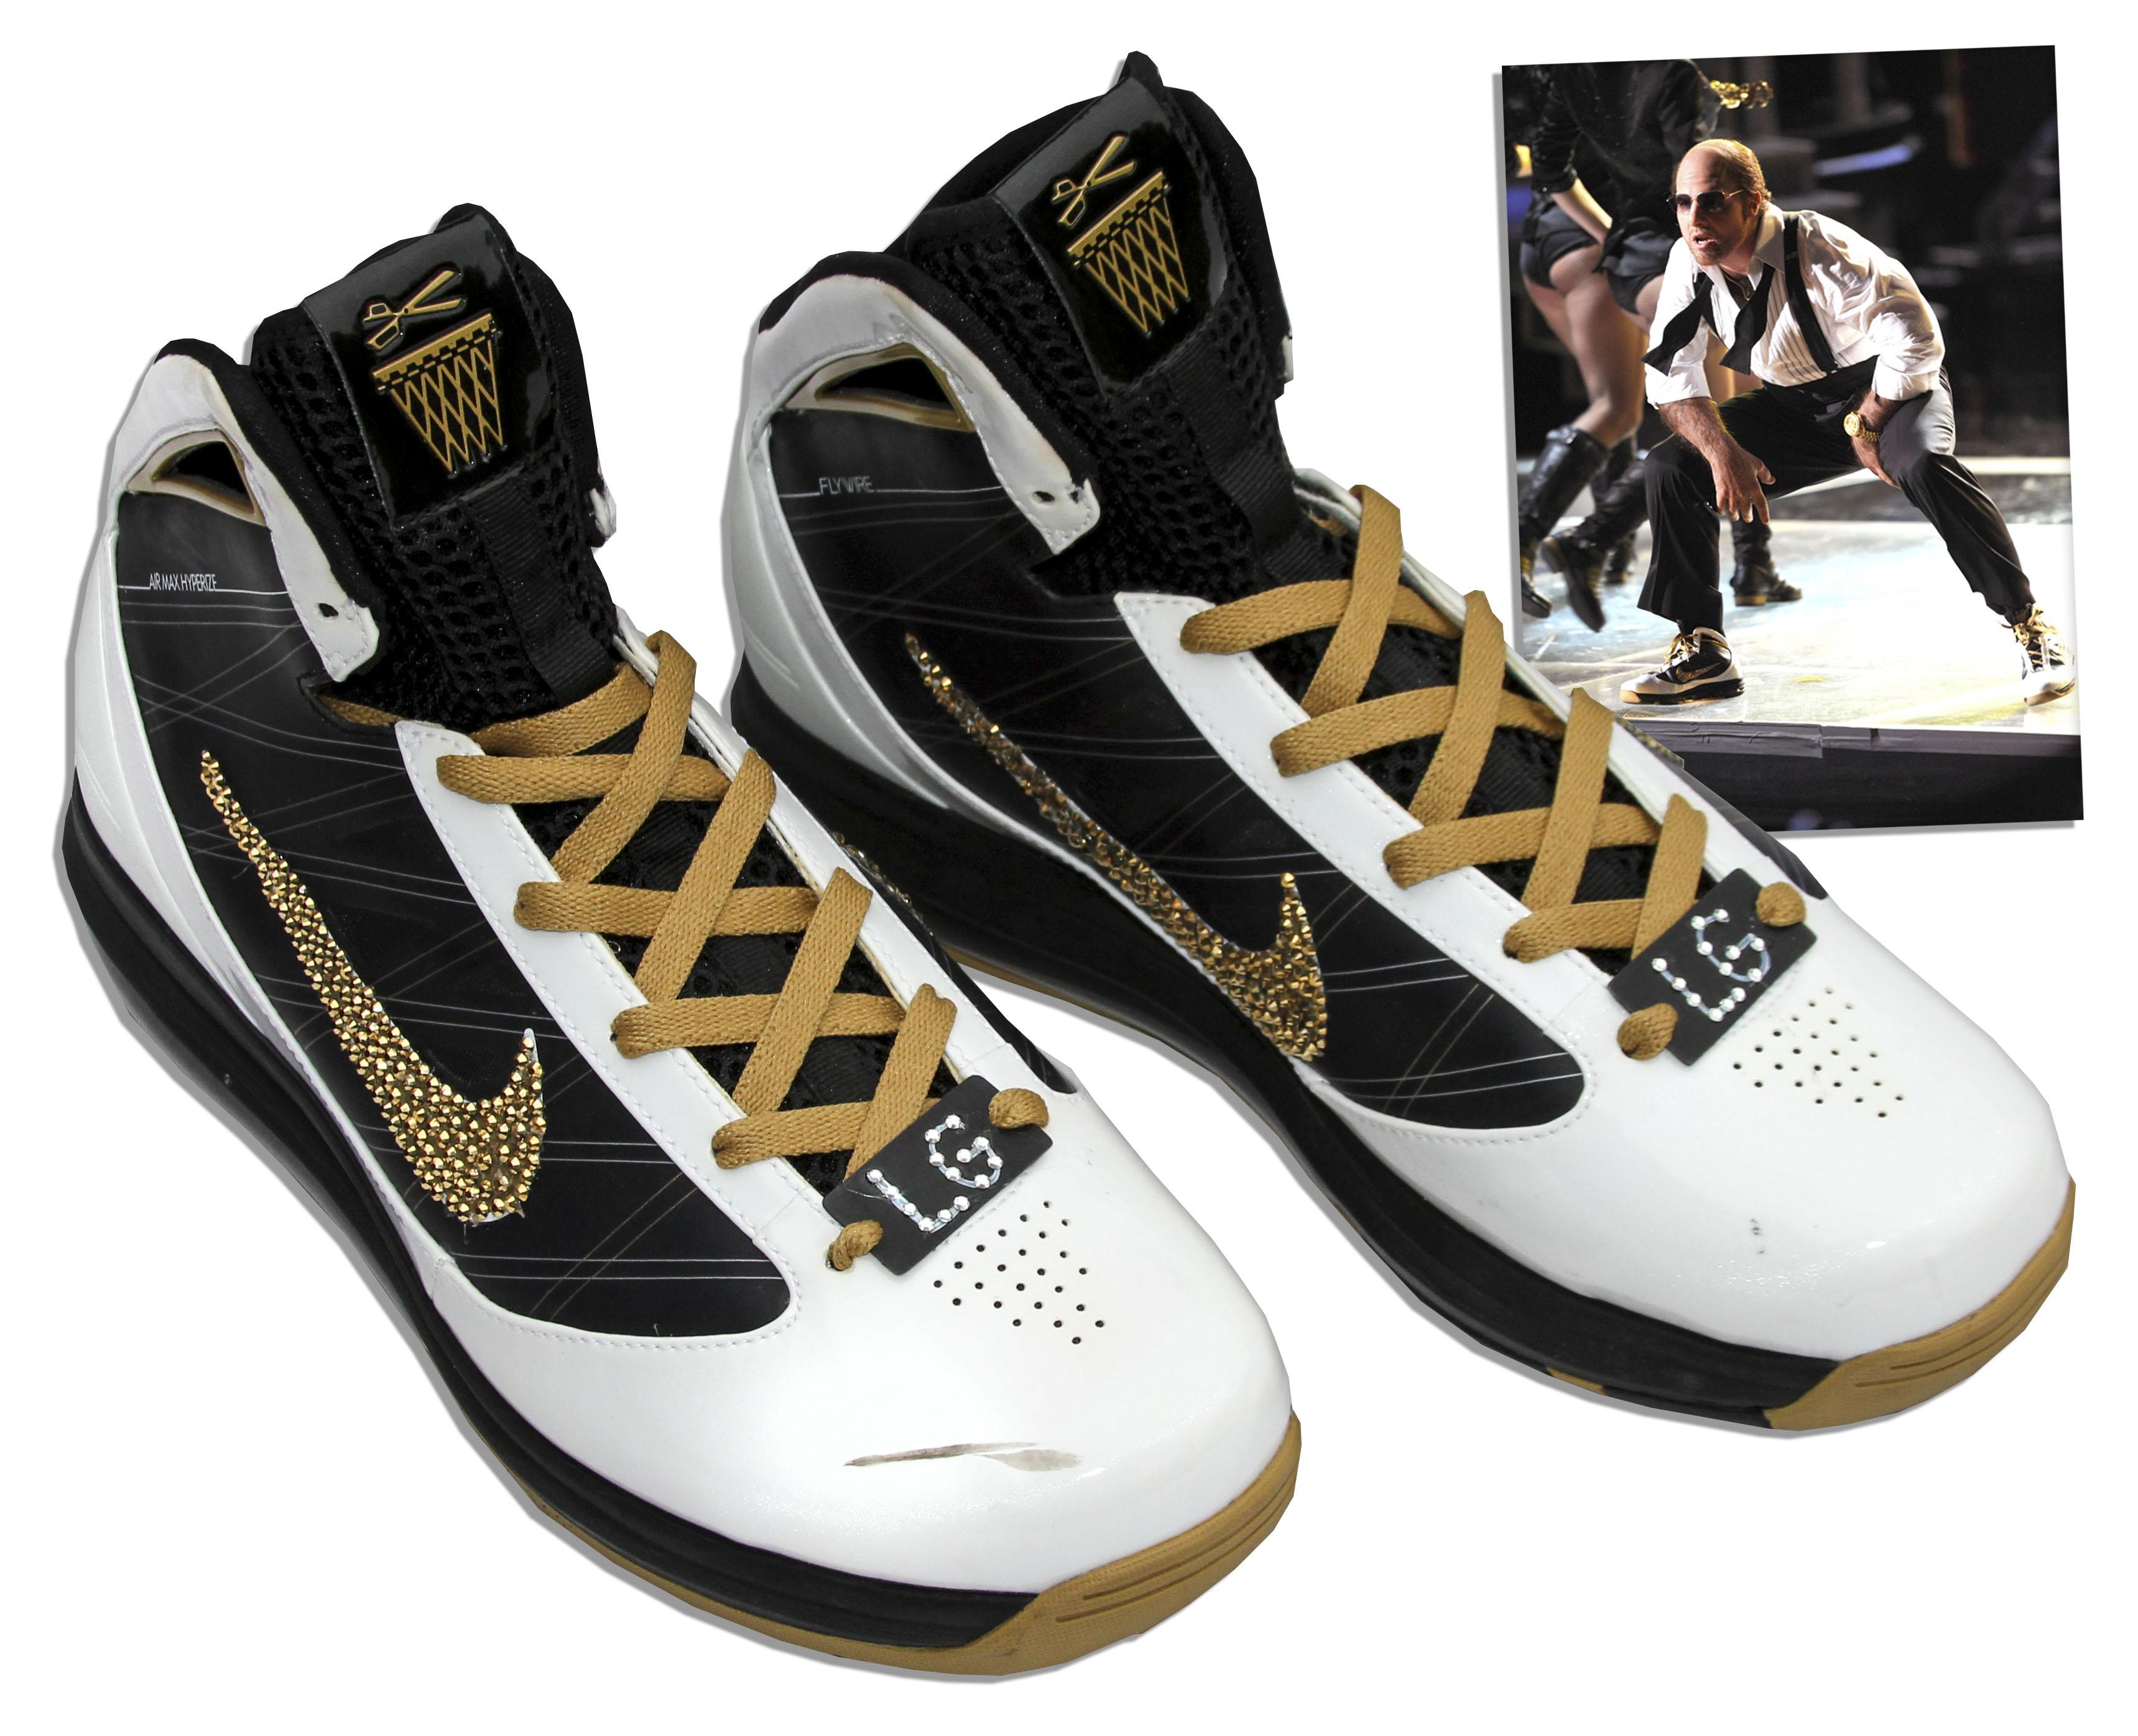 Basketball Shoes Nike Customize Basketball Nike Shoes Customize j4A5RL3q